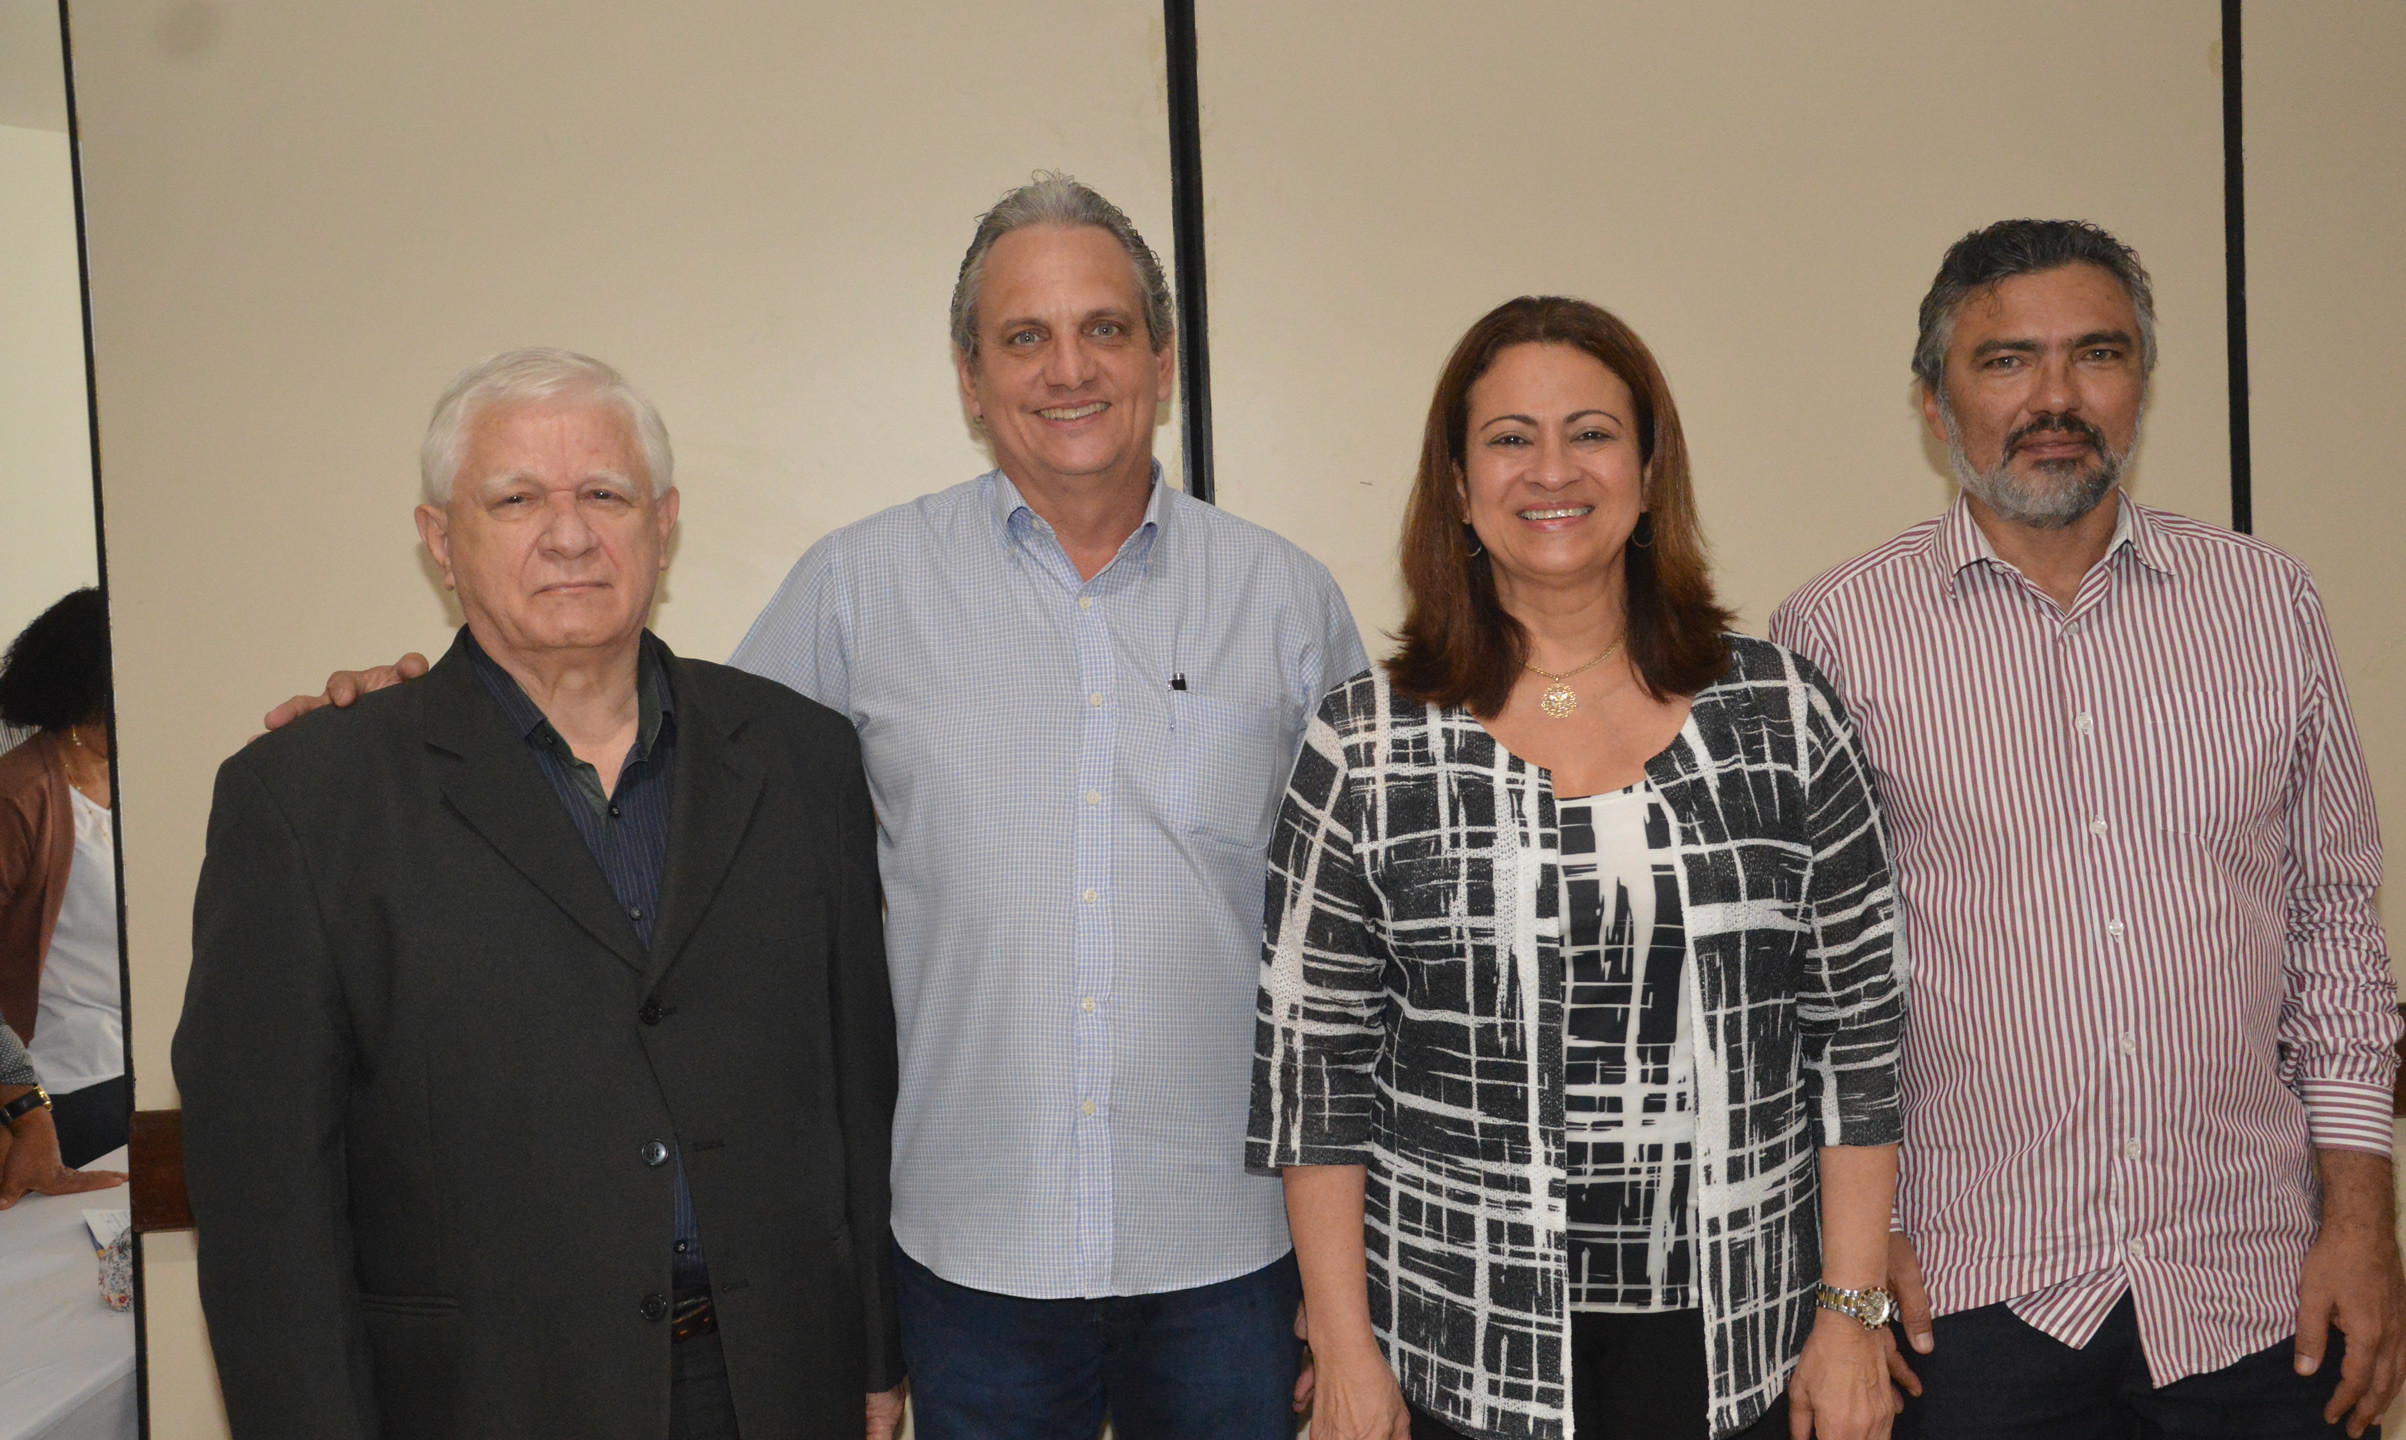 José Lopes, Marcelo Rezende, Léa Cristina Silva e Nauro Muniz